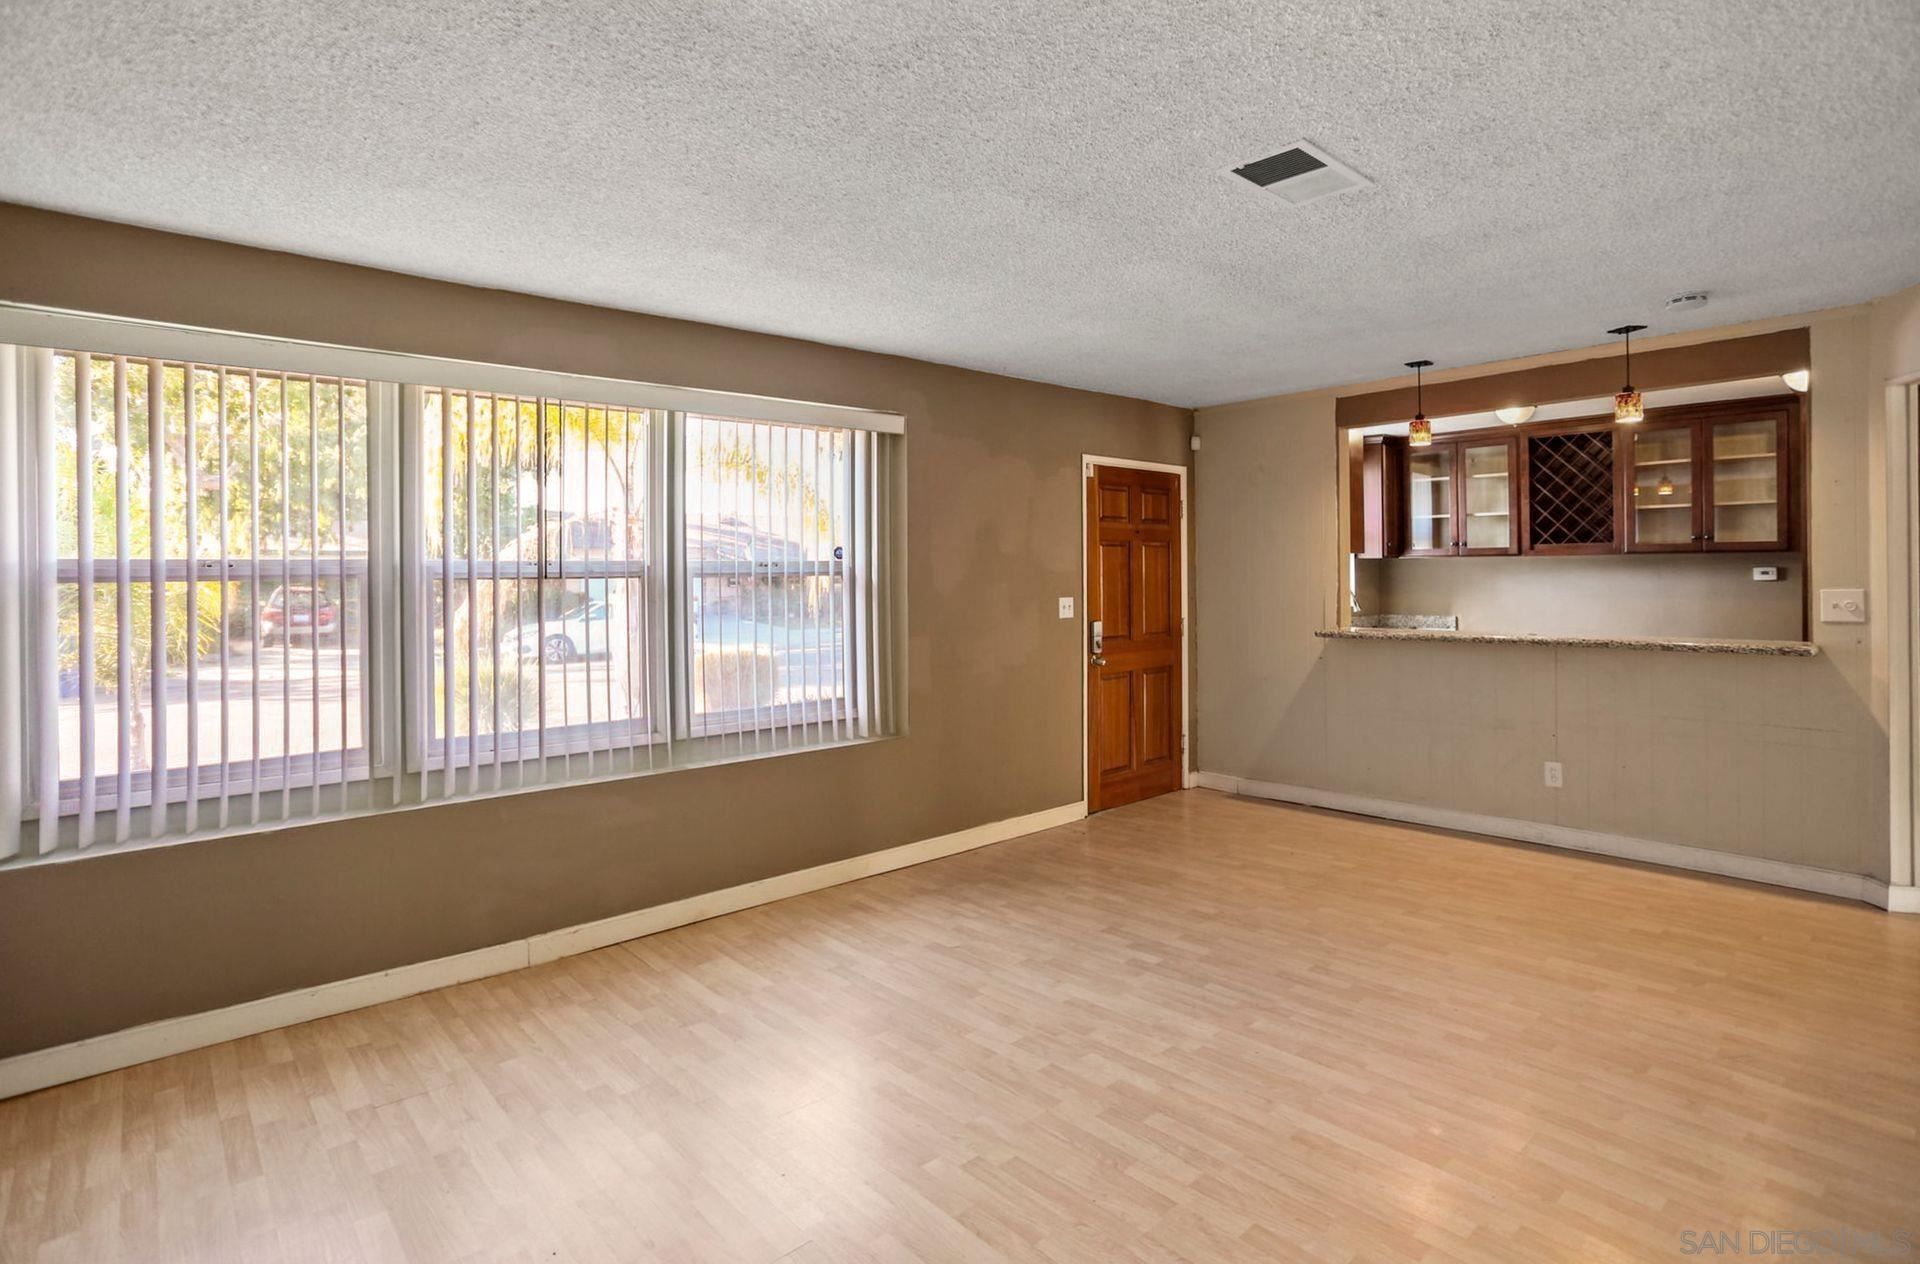 Photo of 9028 Davenrich St, Spring Valley, CA 91977 (MLS # 210029620)